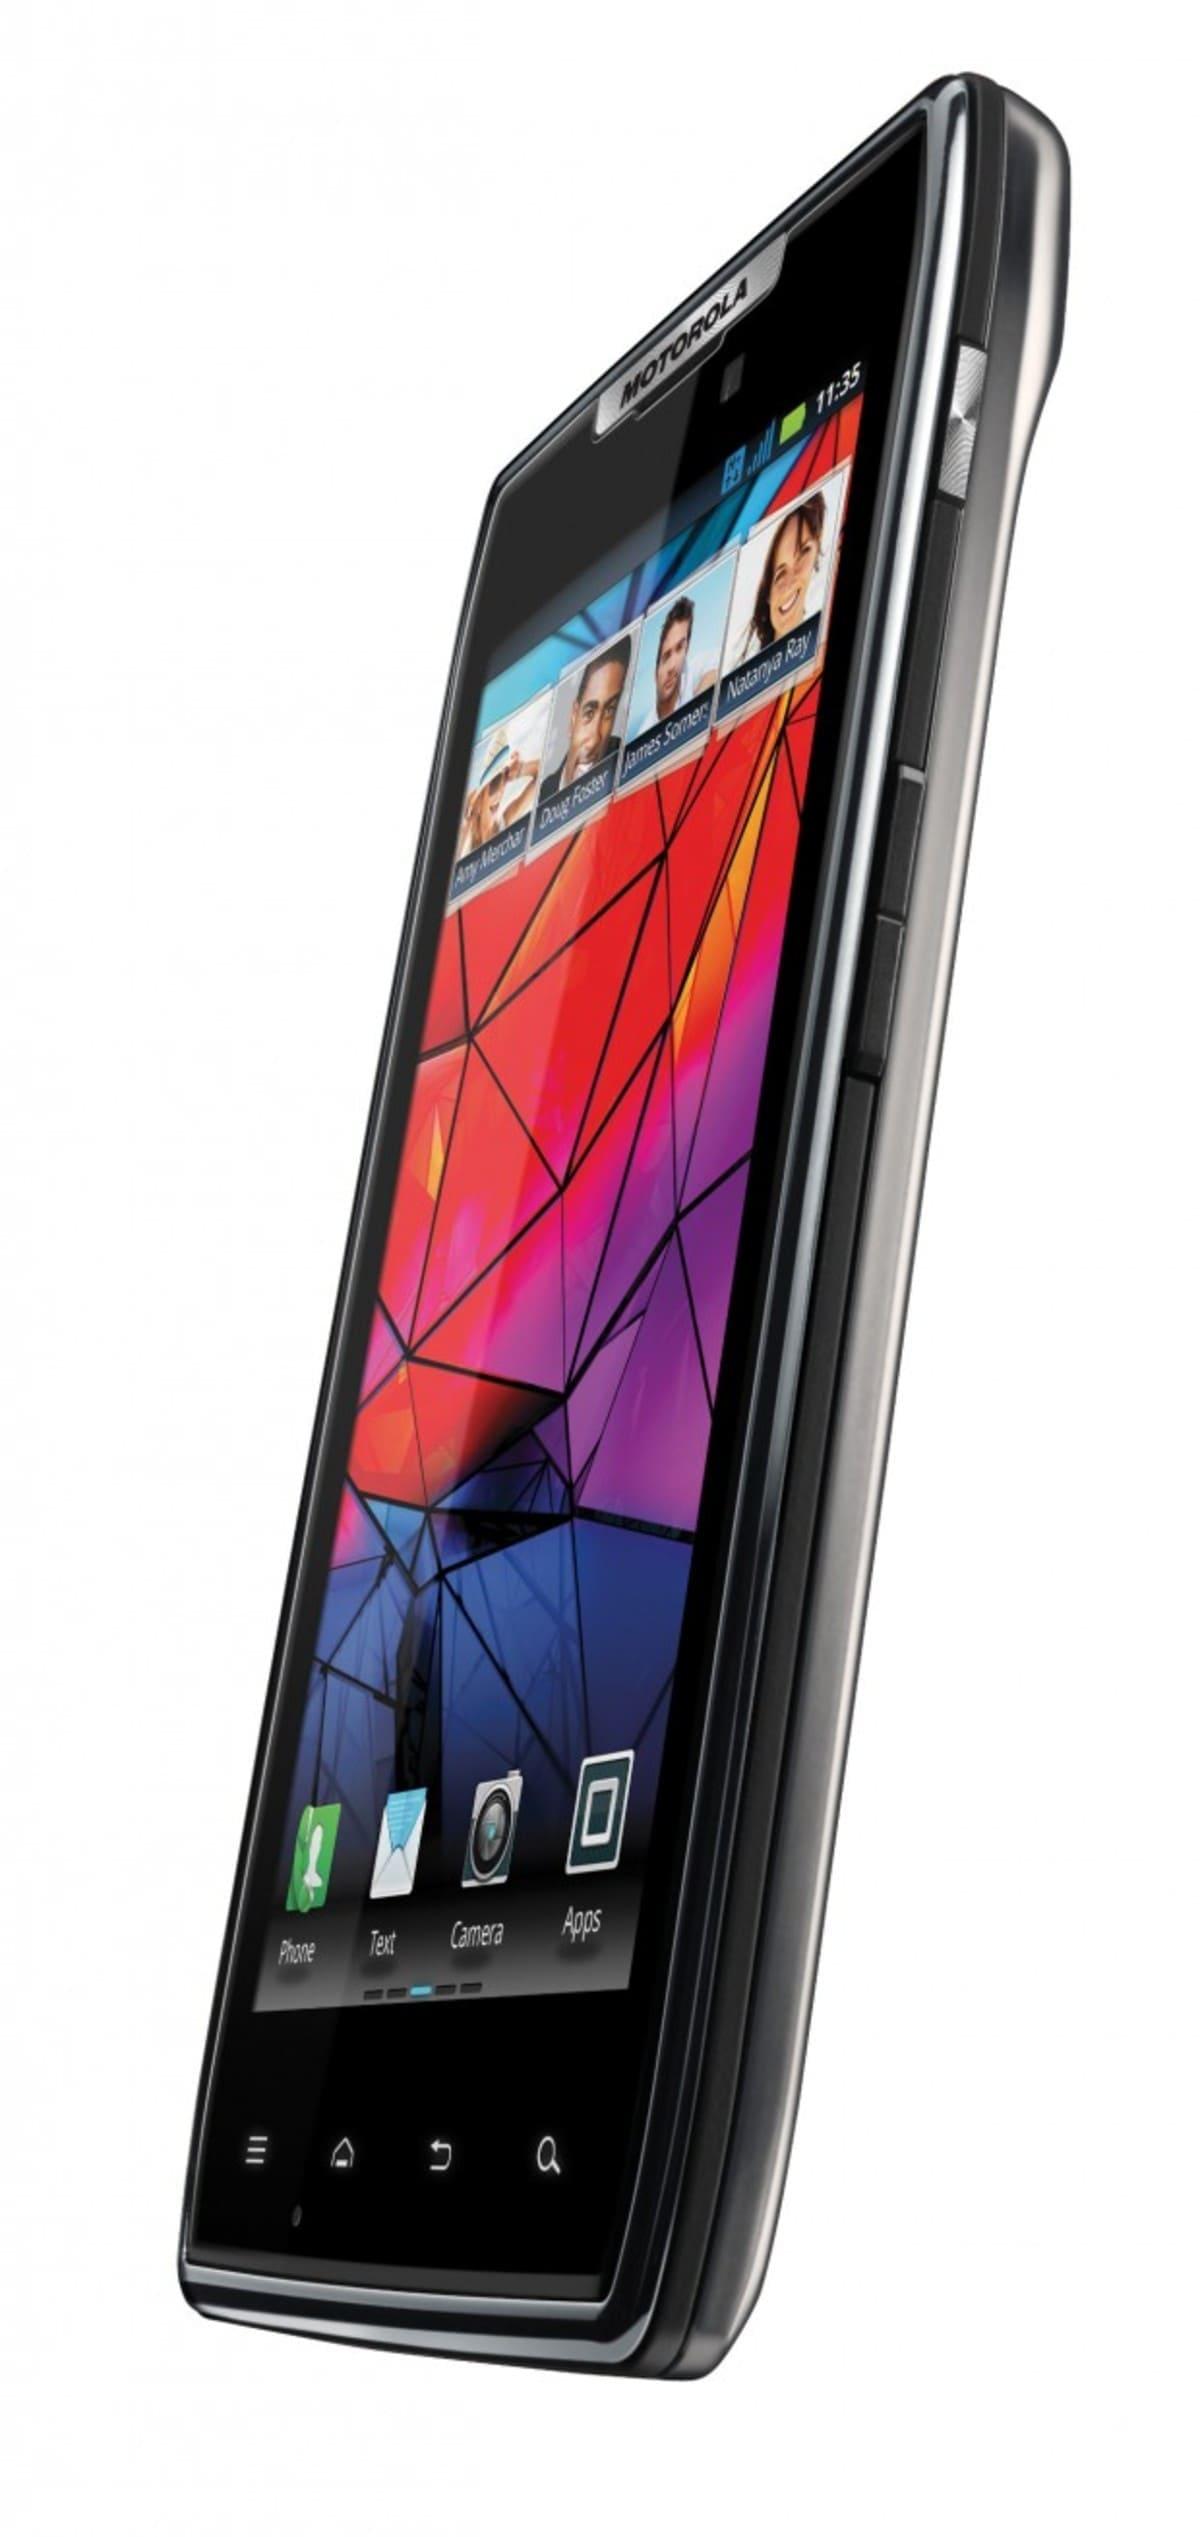 Motorola RAZR 4 e1318960891877 3